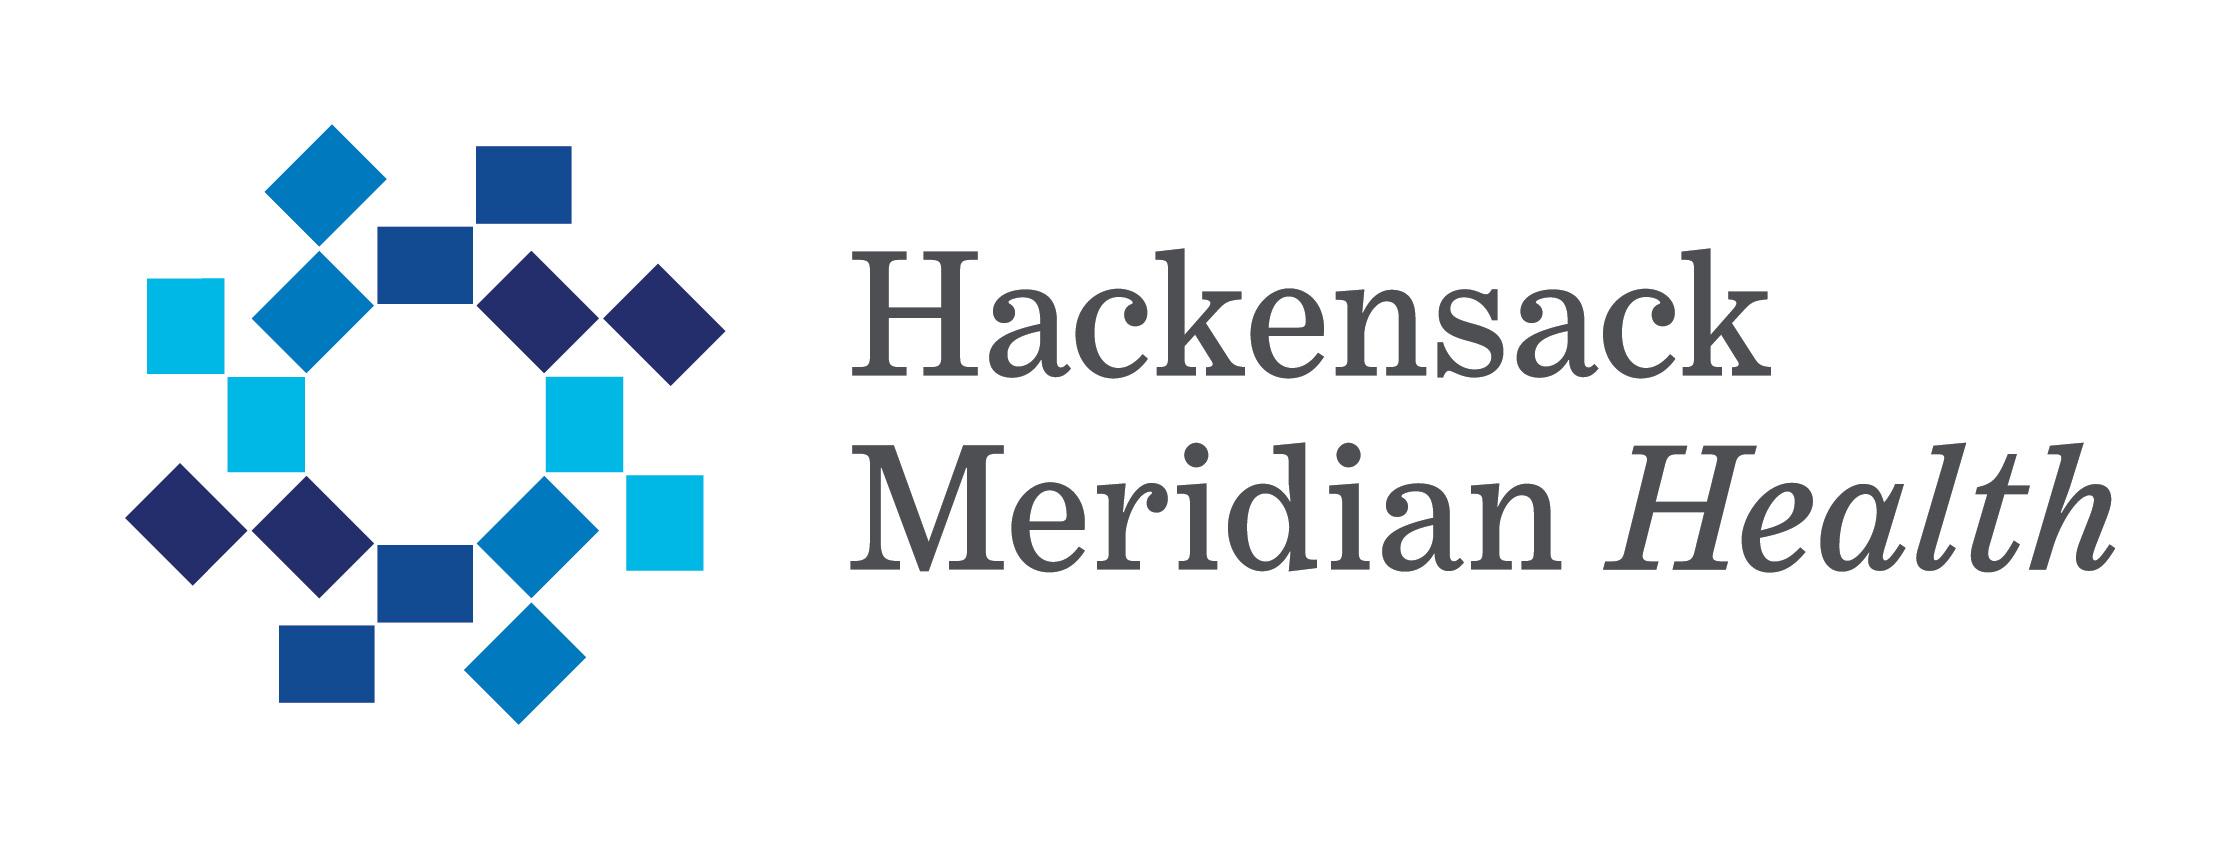 Hackensack Meridian Health Sponsor